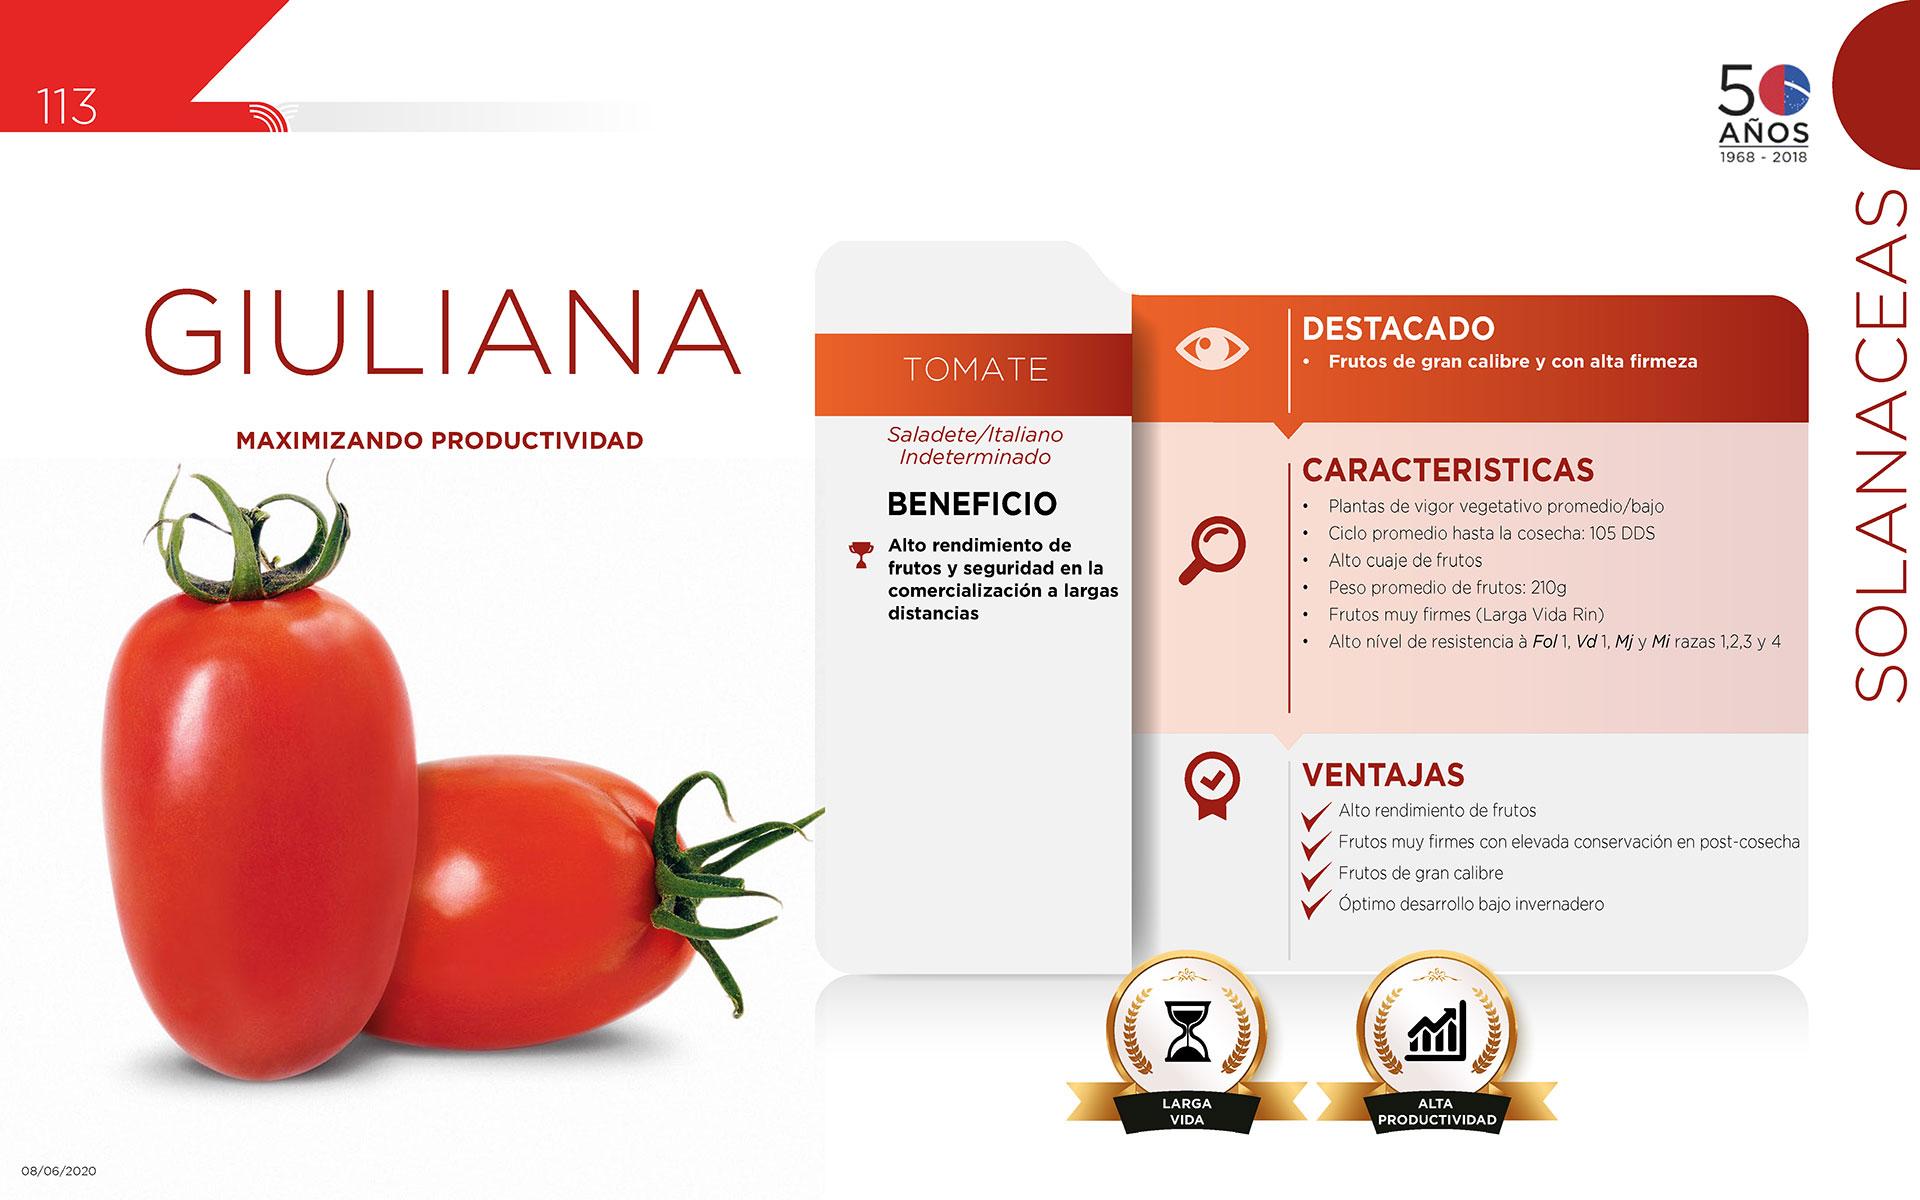 Giuliana - Solanaceas